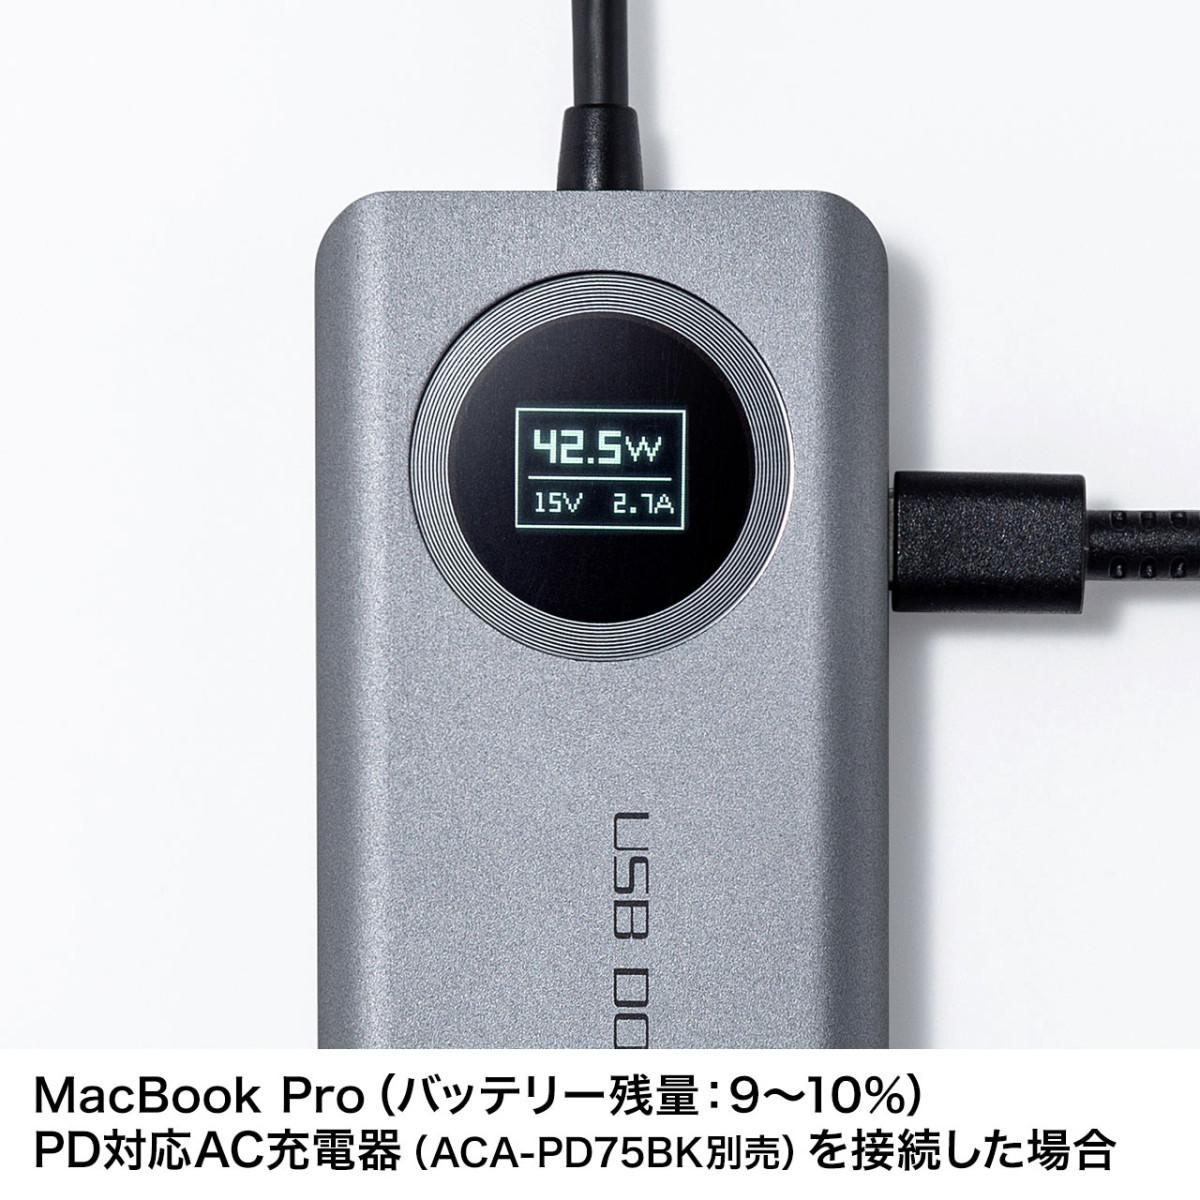 [USB-DKM1] USB3.2 Gen2対応Type-Cドッキングステーション